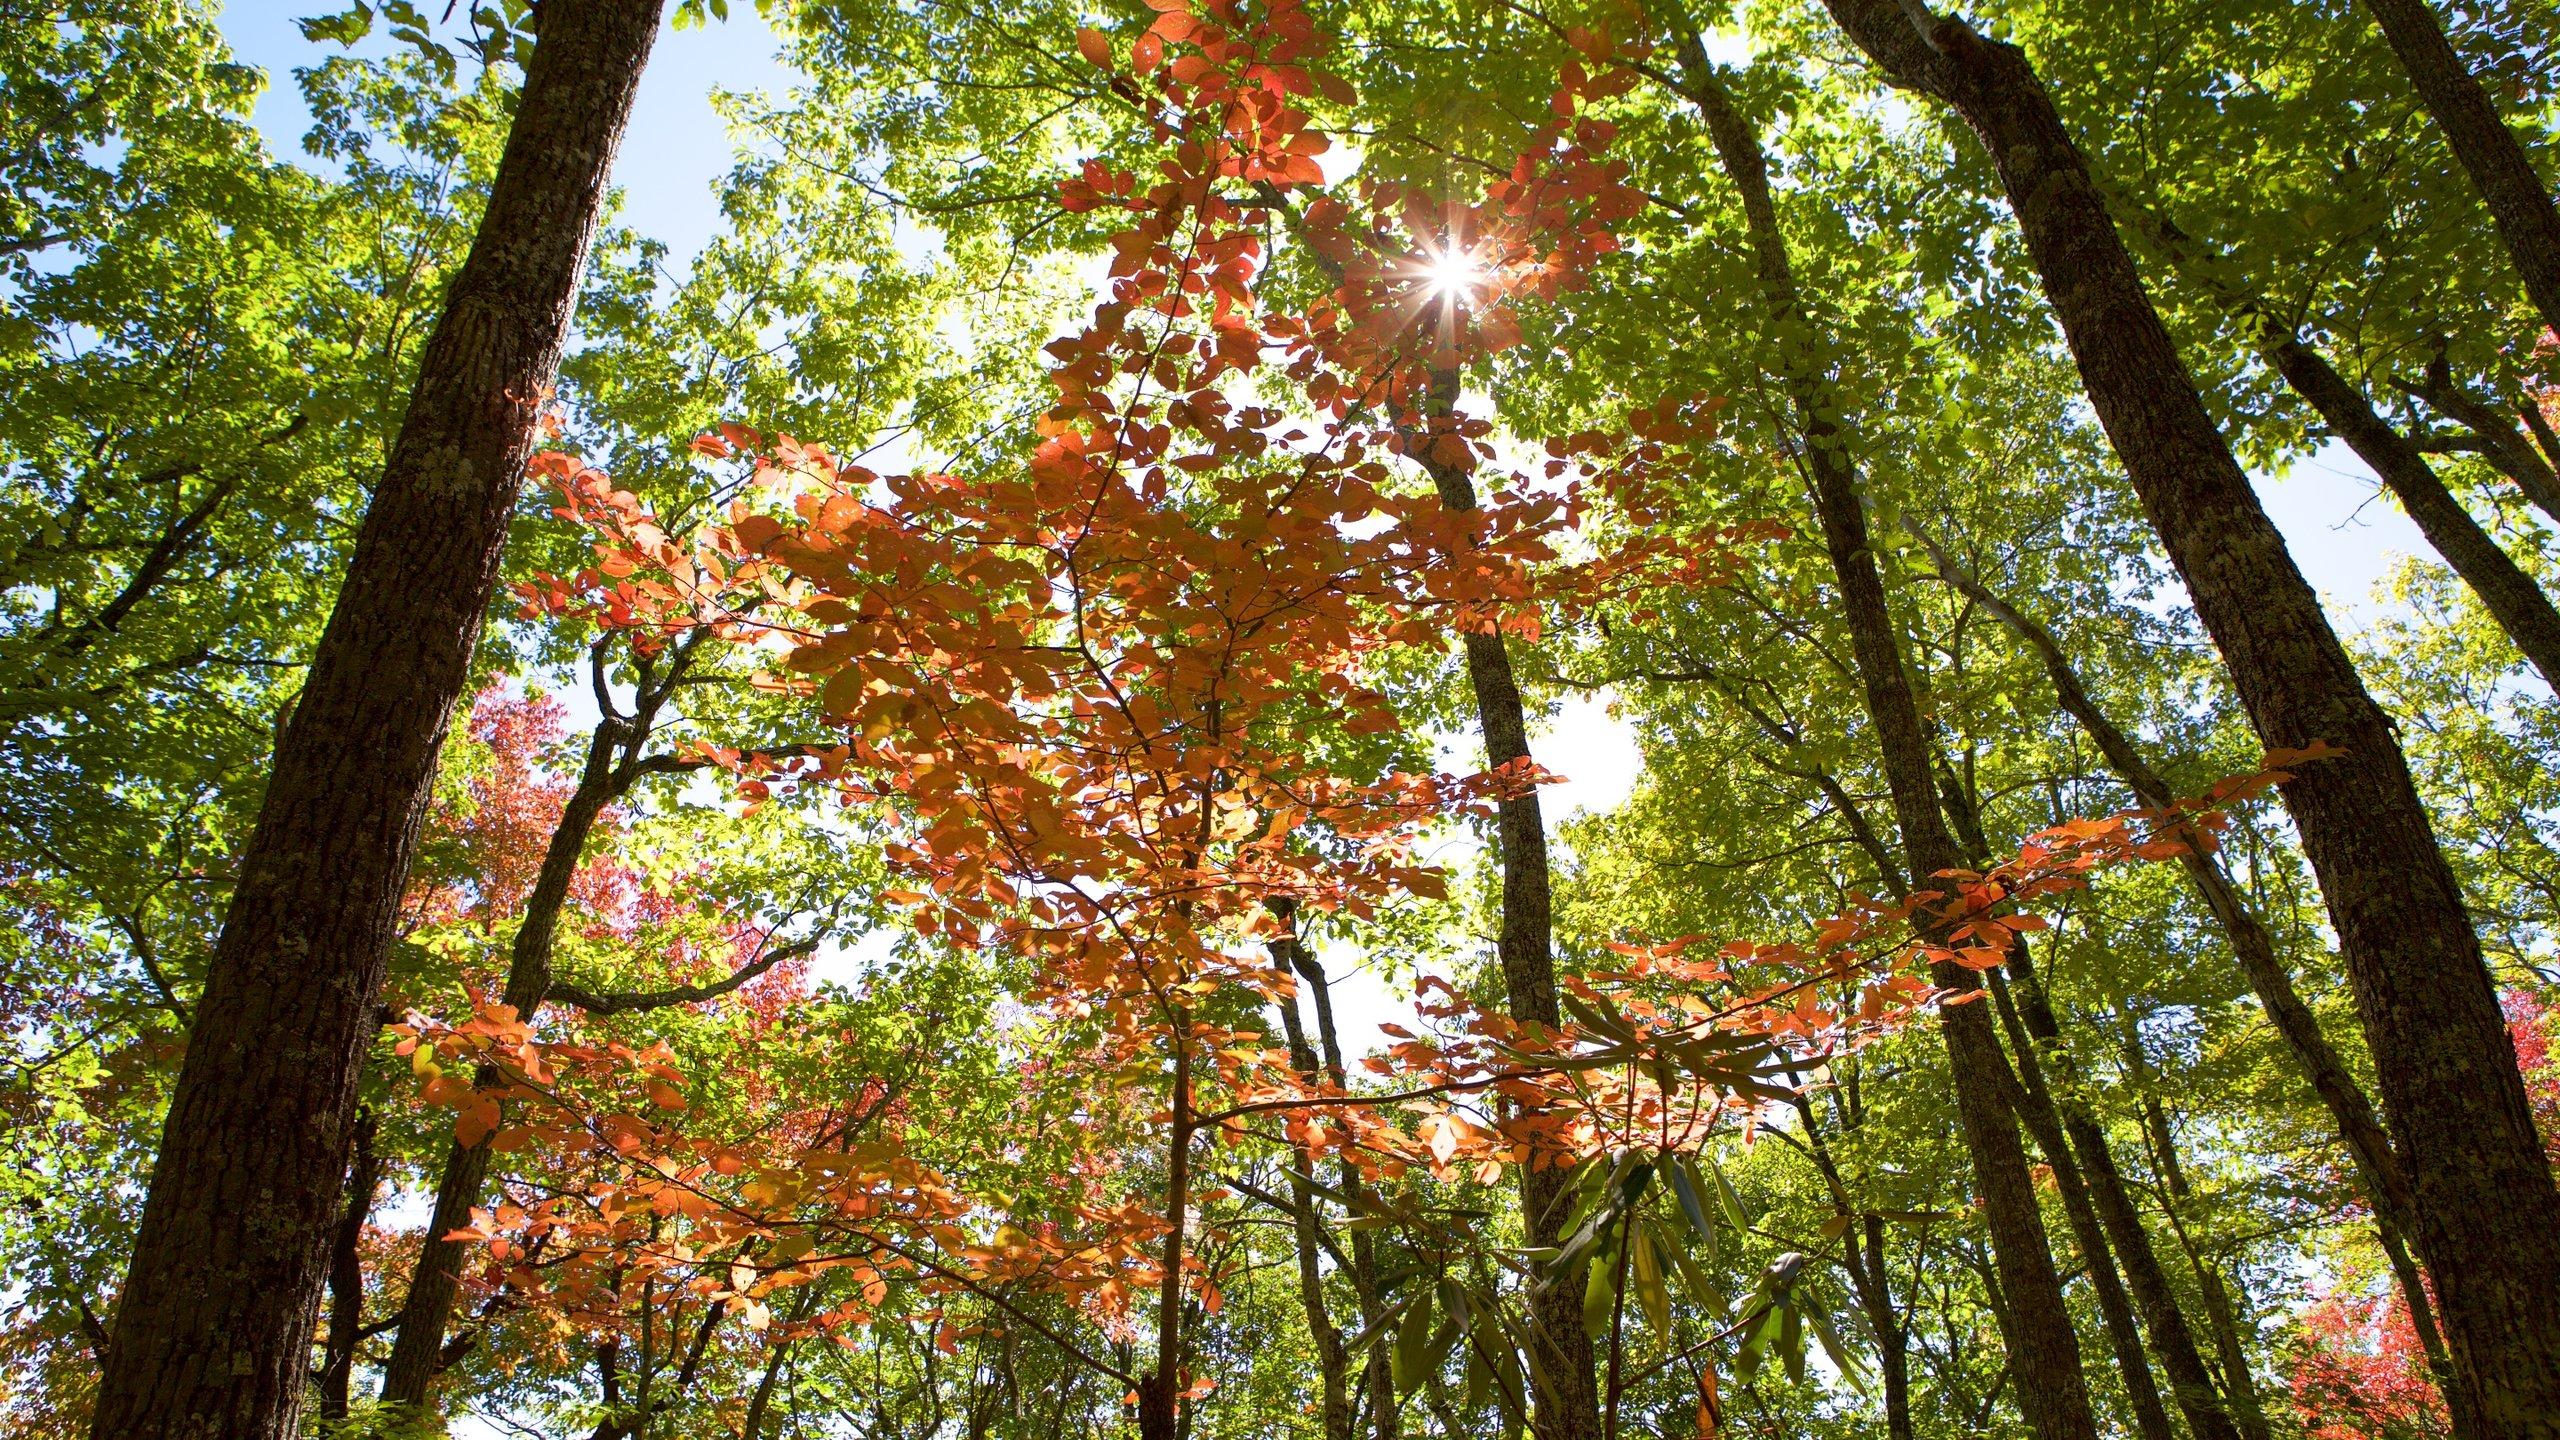 Laurel Falls, Gatlinburg, Tennessee, United States of America